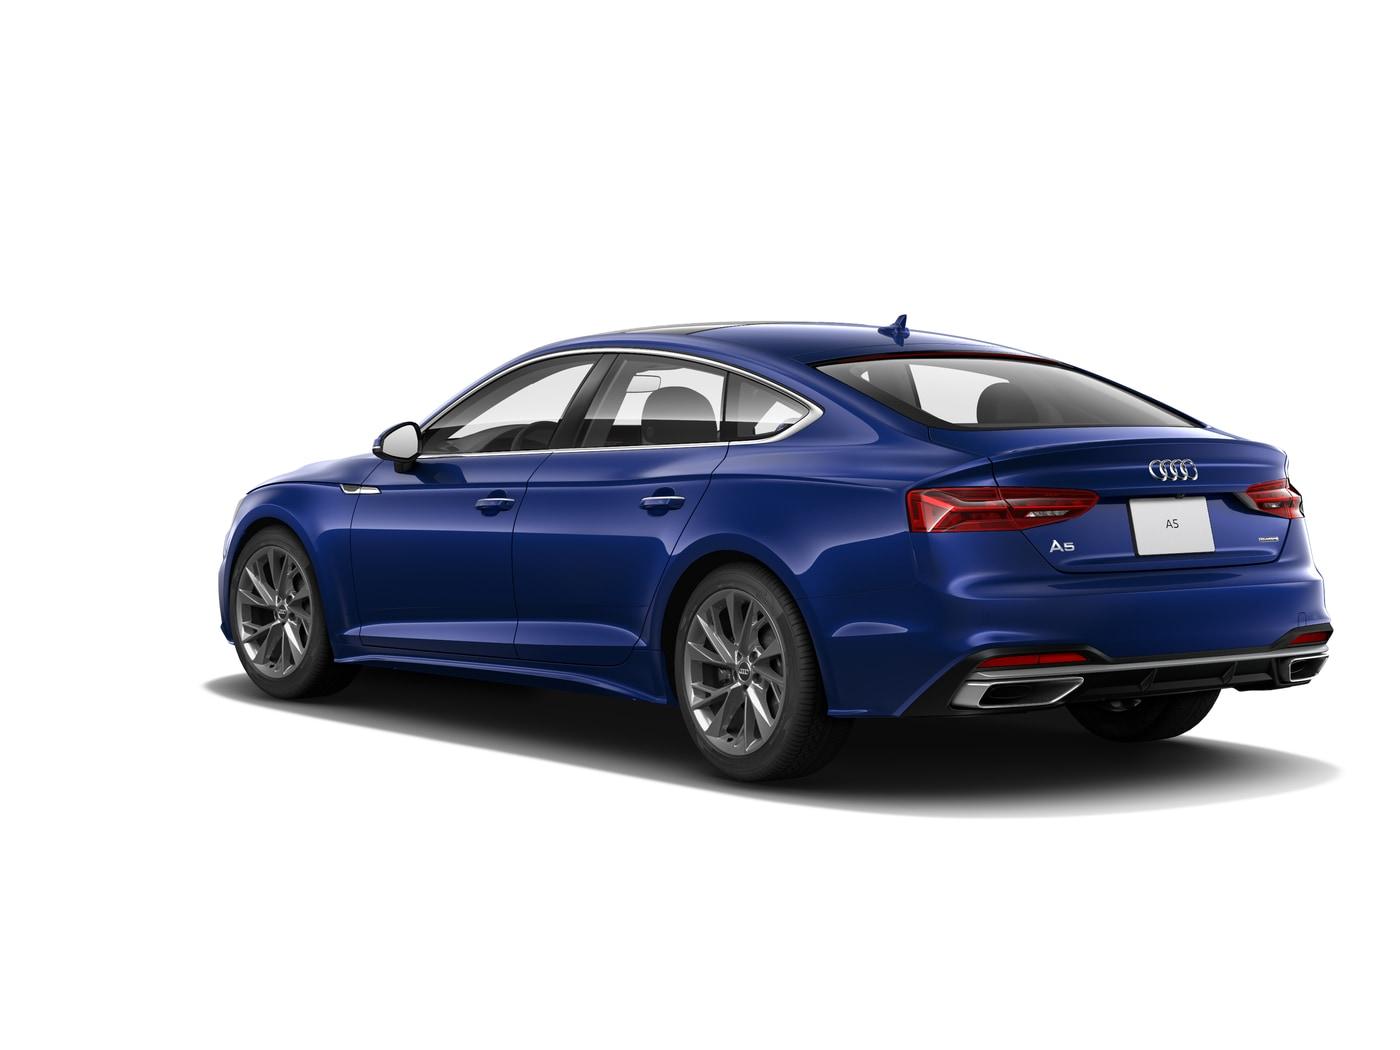 New 2020 Audi A5 Sportback 2 0t Premium Plus Navarra Blue For Sale In Calabasas Ca Stock Ac03187